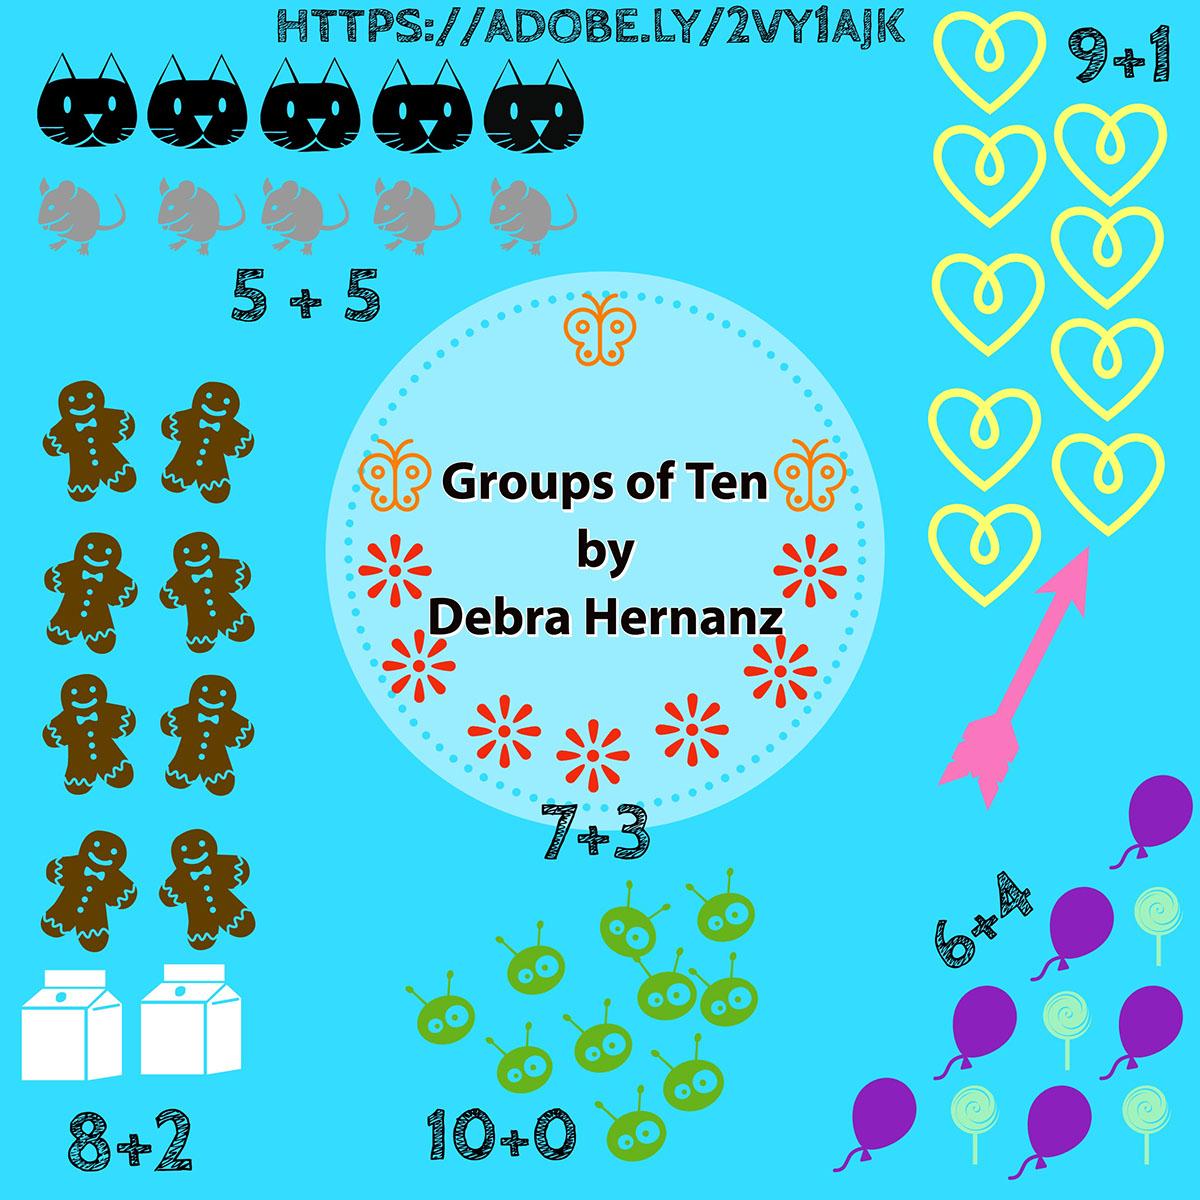 6+4 6+4<P>8+2<P>7+3<P>9+1<P>10+0<P>5 + 5<P>Groups of Ten<BR>by<BR>Debra Hernanz<P>https://adobe.ly/2vy1Ajk